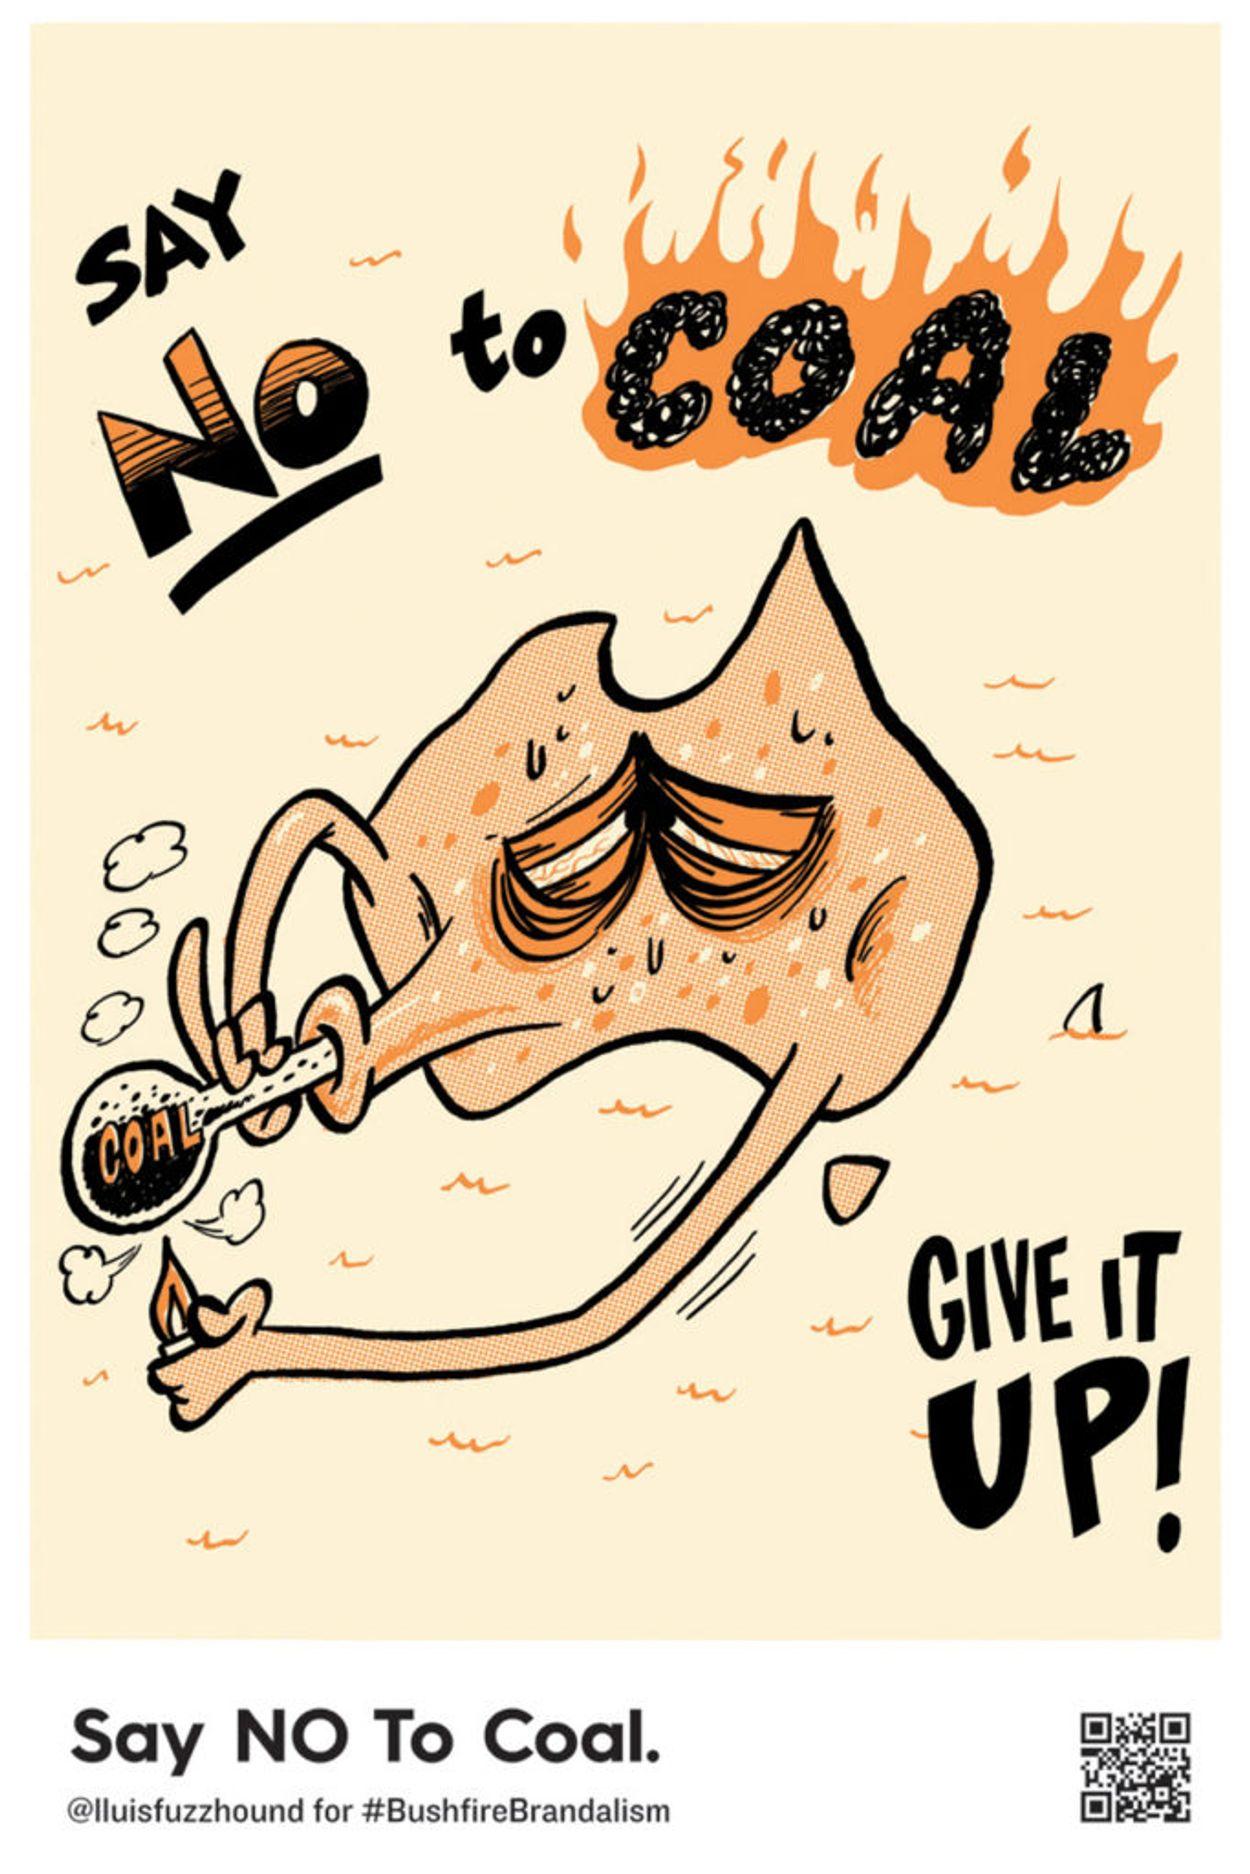 12_a Fuzzhound-See.-Hear.-Speak-say-no-to-coal--683x1024